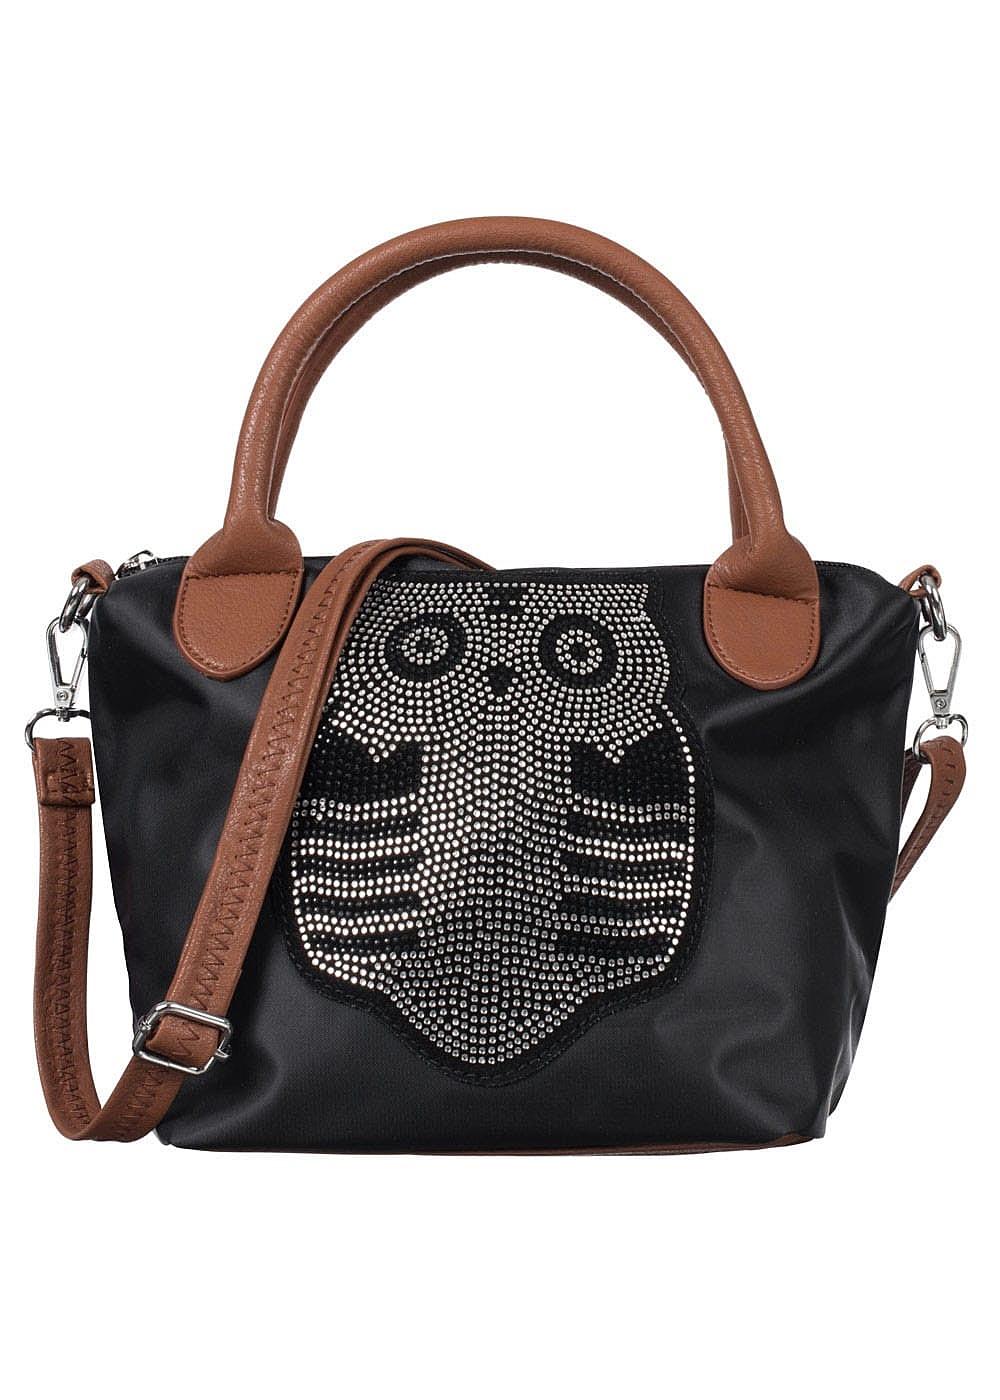 hailys damen handtasche klein h he 20cm breite 30cm eule. Black Bedroom Furniture Sets. Home Design Ideas